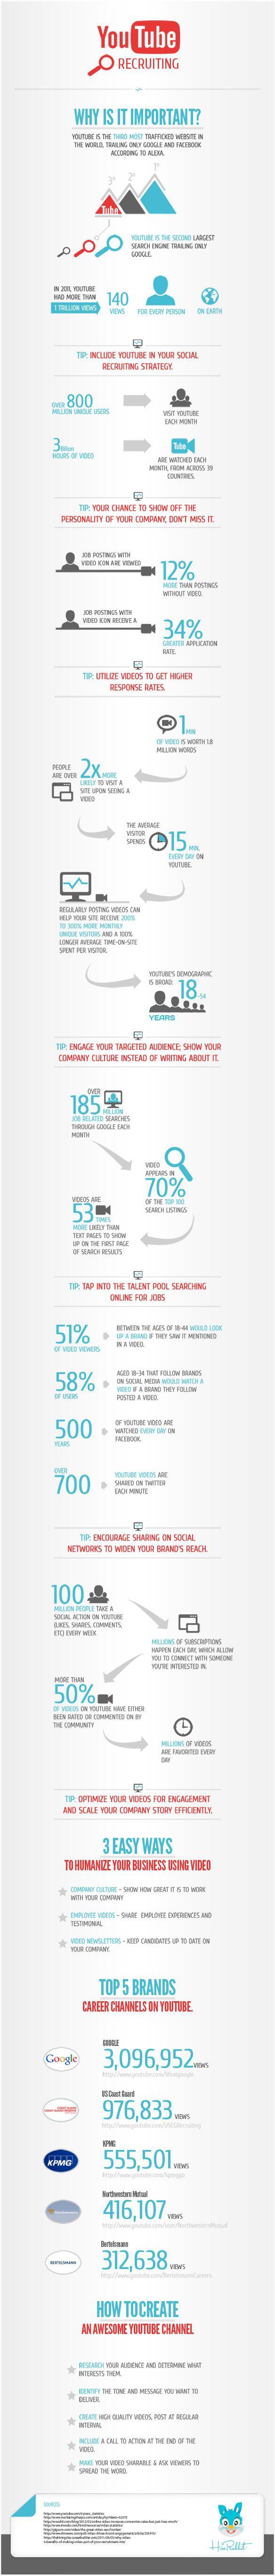 #SocialMedia #Infographics - Why Use YouTube For Recruitment? #Infografia